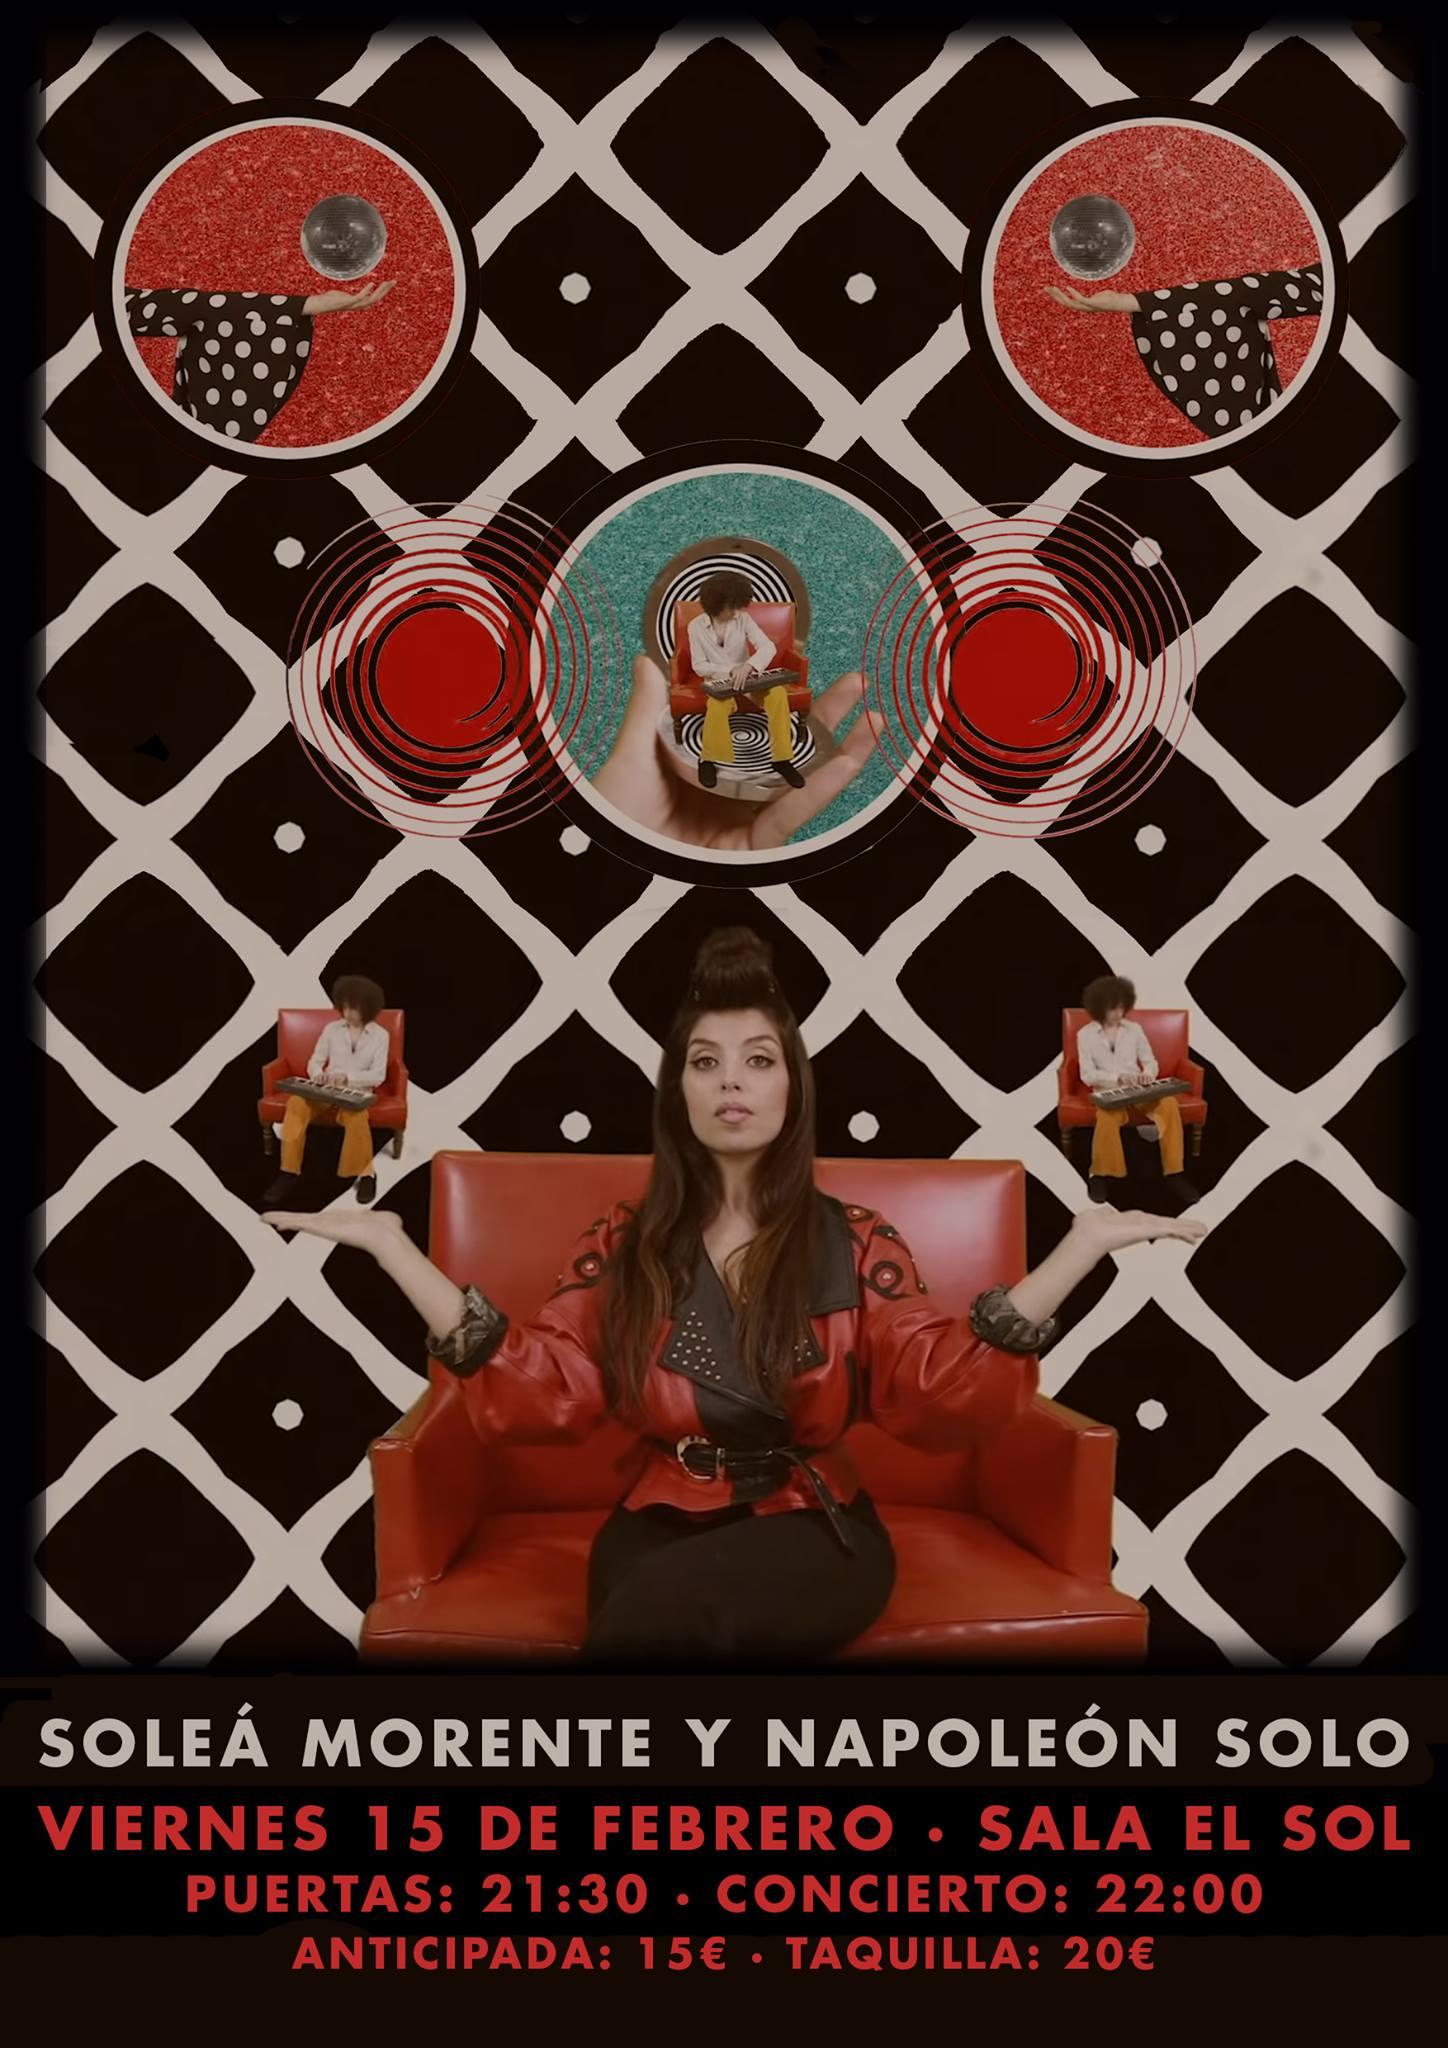 Solea Morente 15 febrero 2019 Madrid Fin de gira